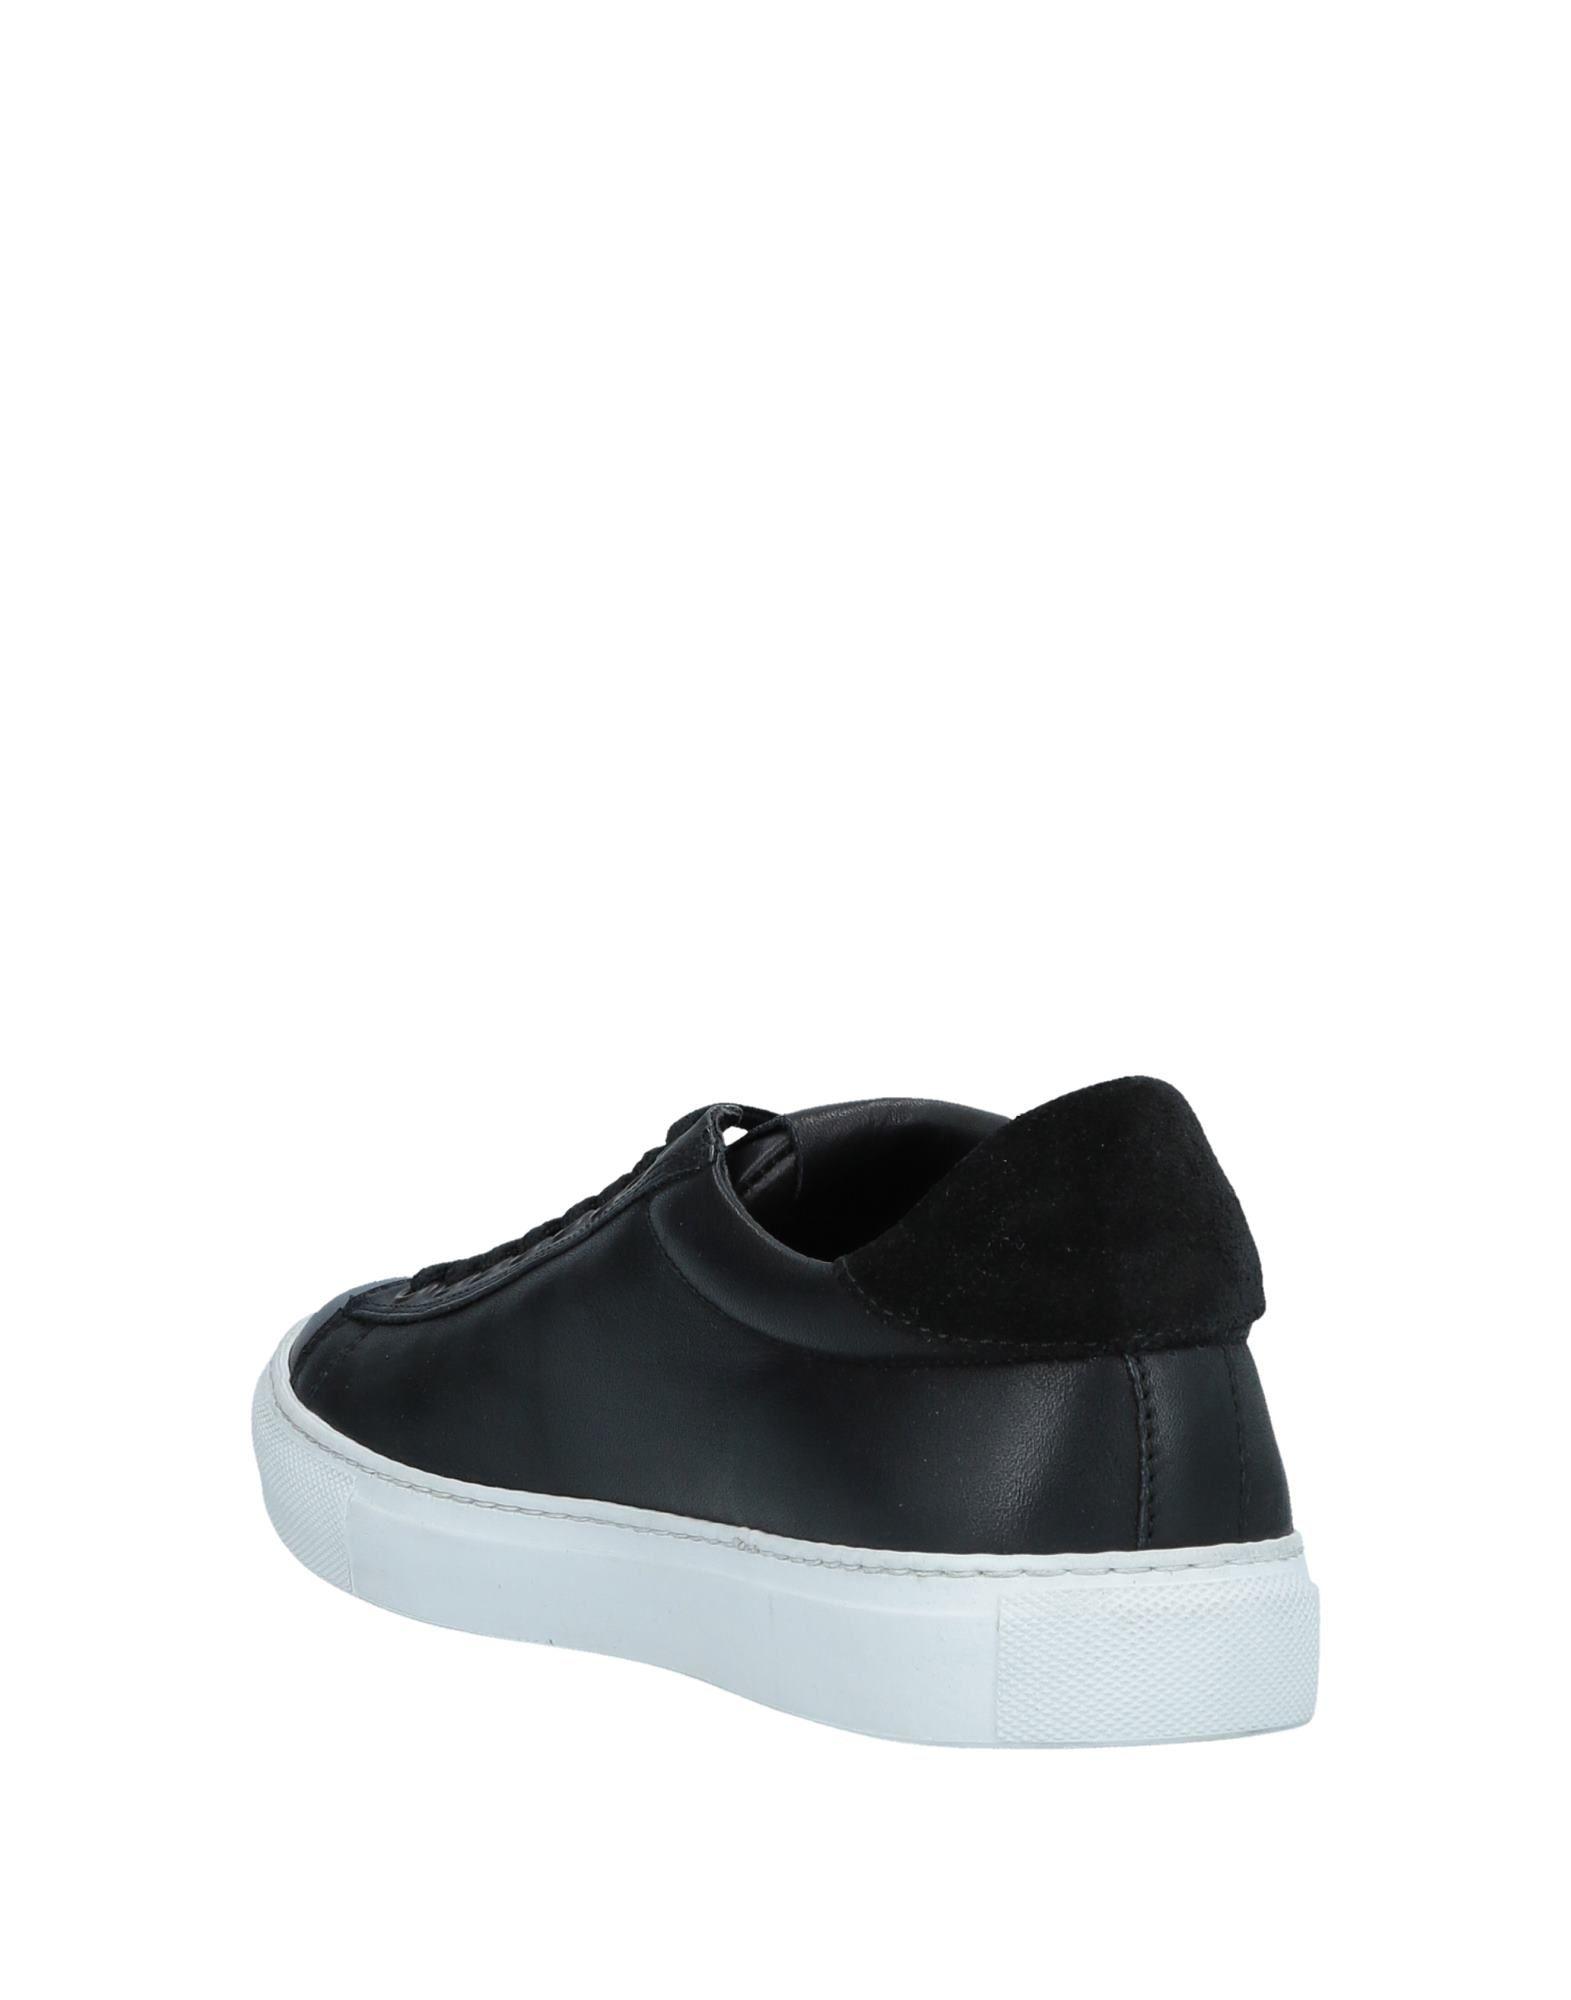 Rabatt Schuhe echte Schuhe Rabatt Daniele Alessandrini Sneakers Herren  11531990KL 835965